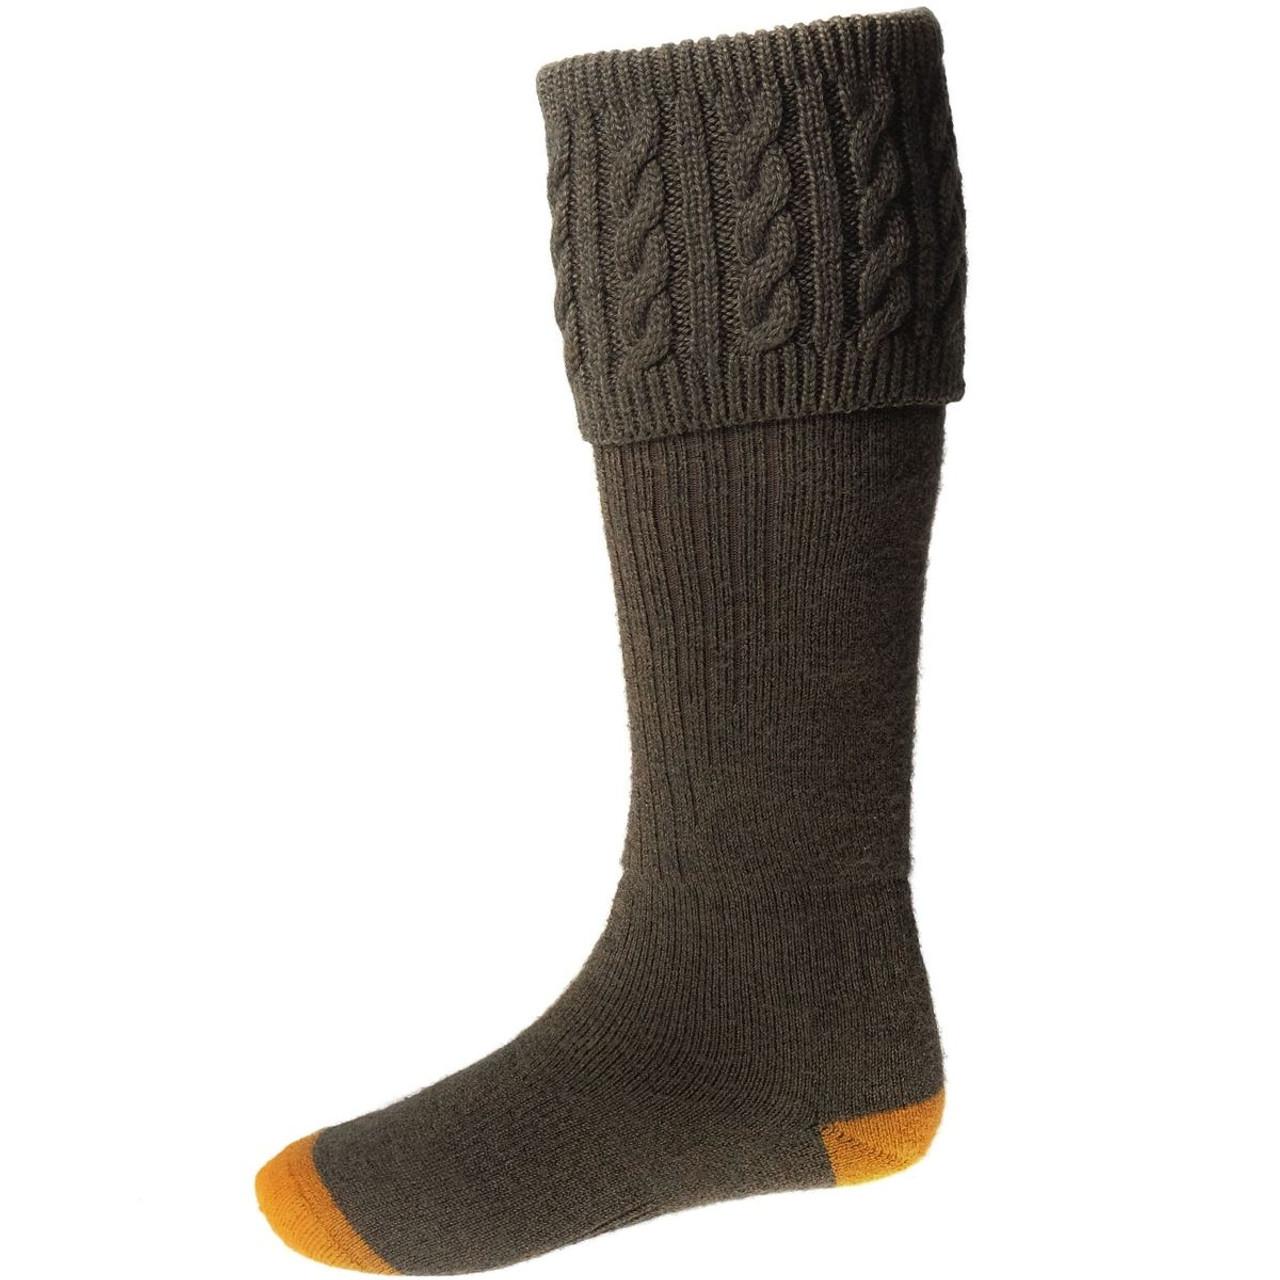 House Of Cheviot Sutherland Socks